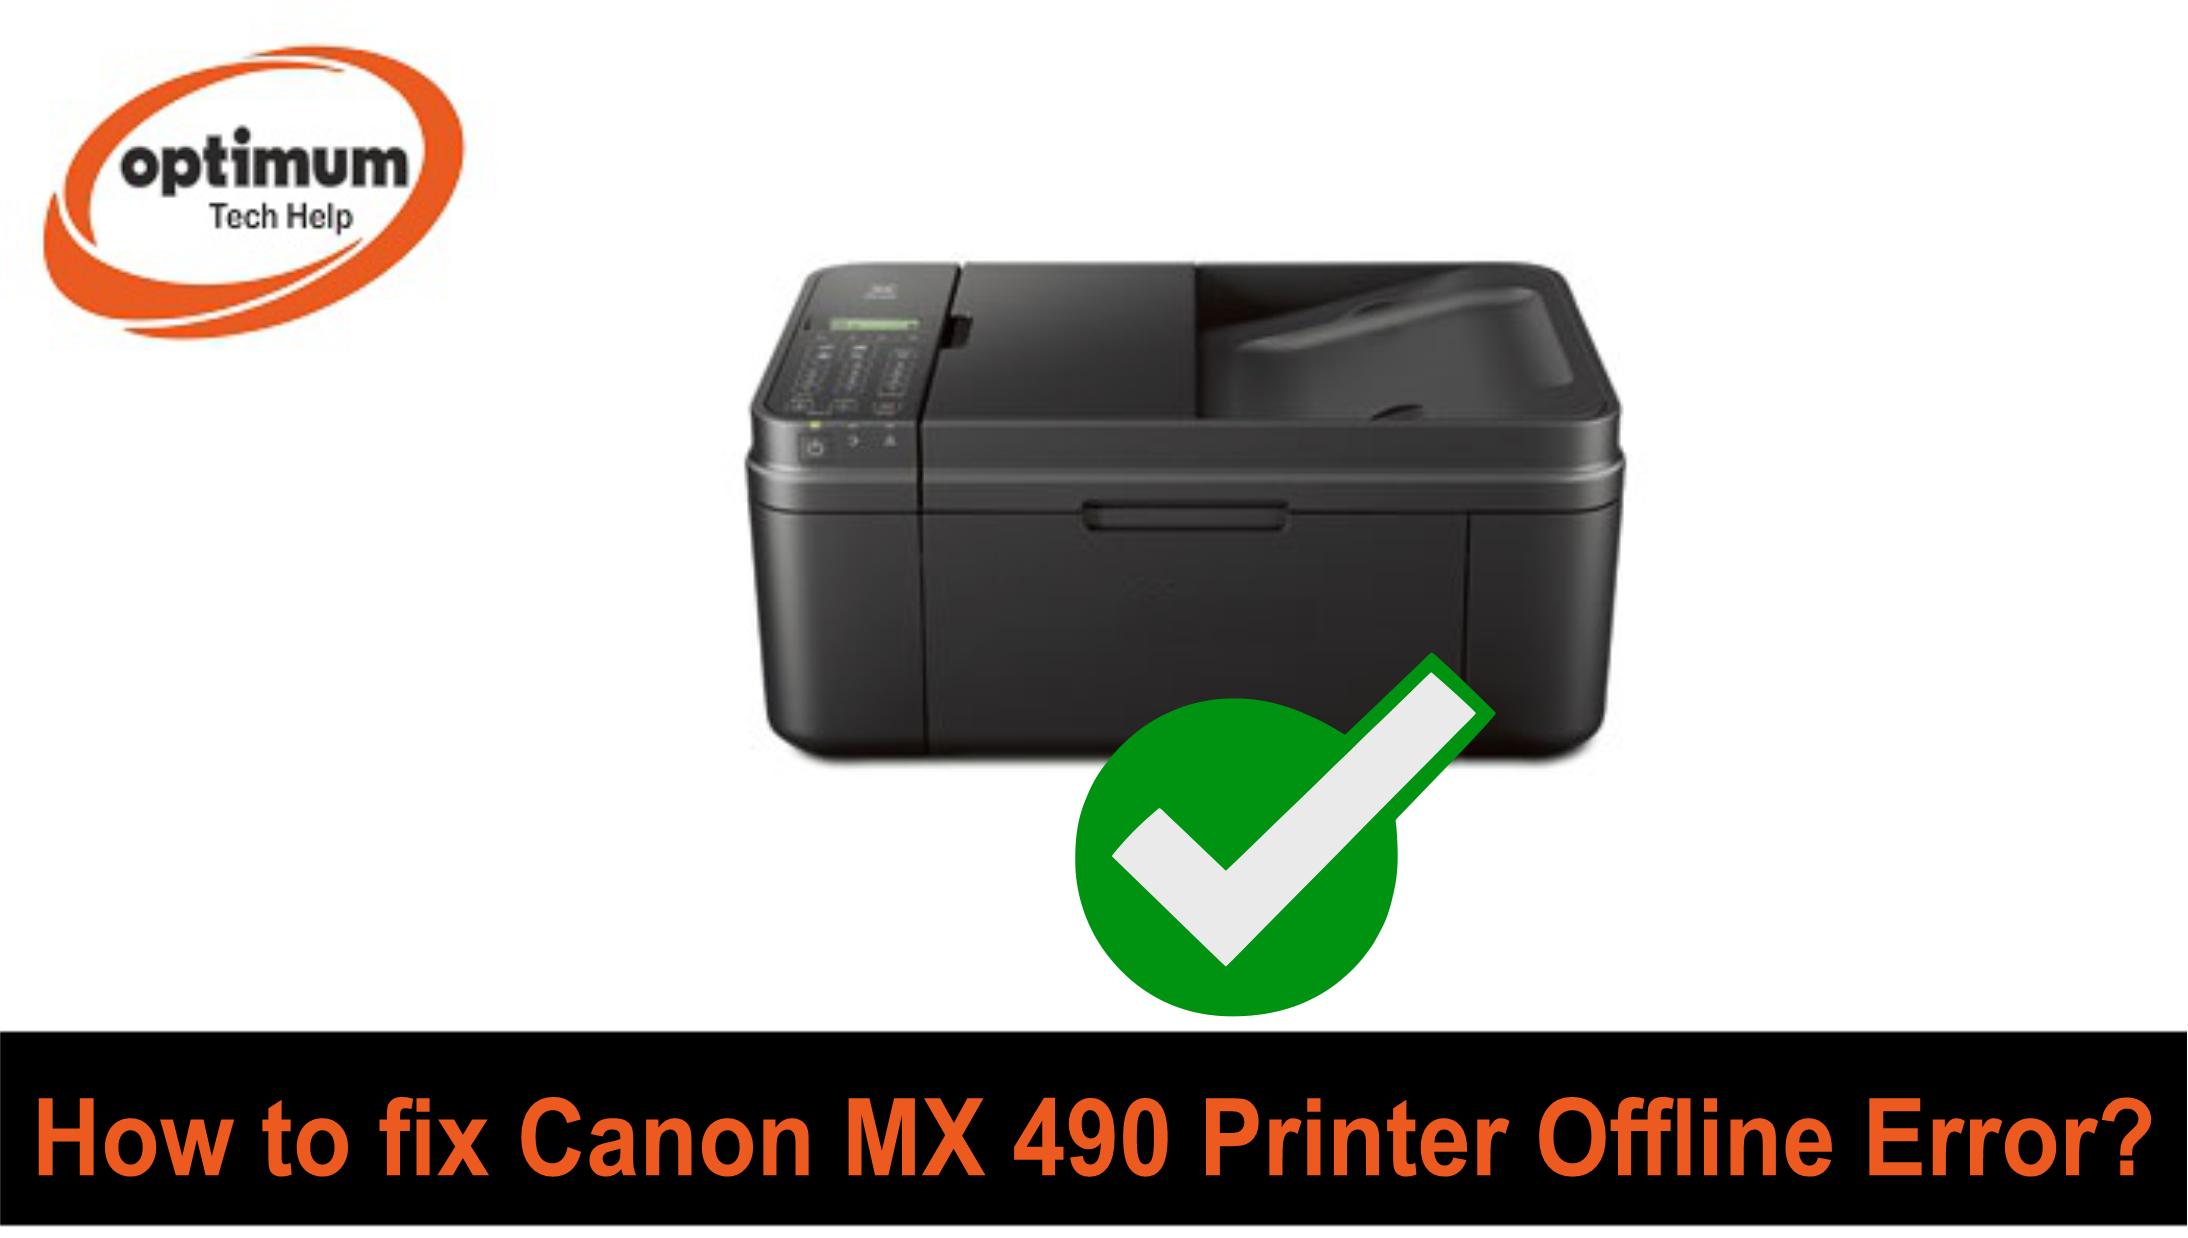 canon mx490 printer offline